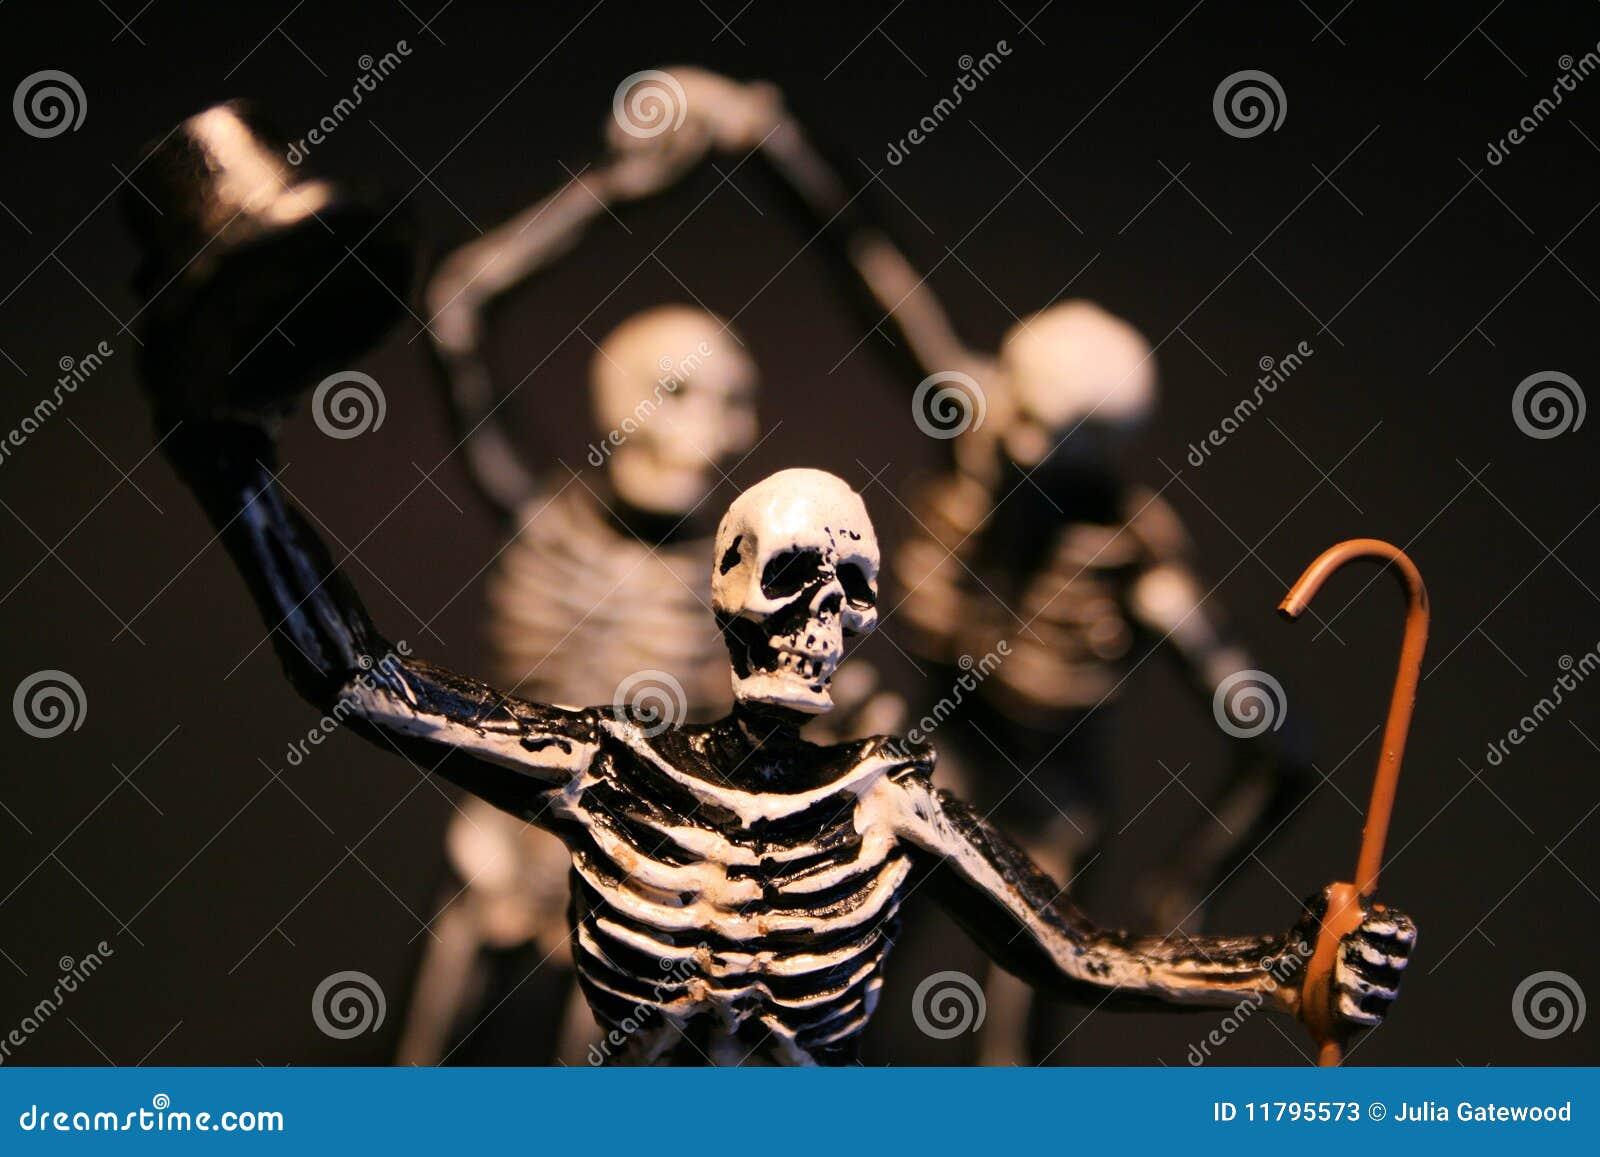 Download Halloween Skeletons stock image. Image of skeletons, skull - 11795573